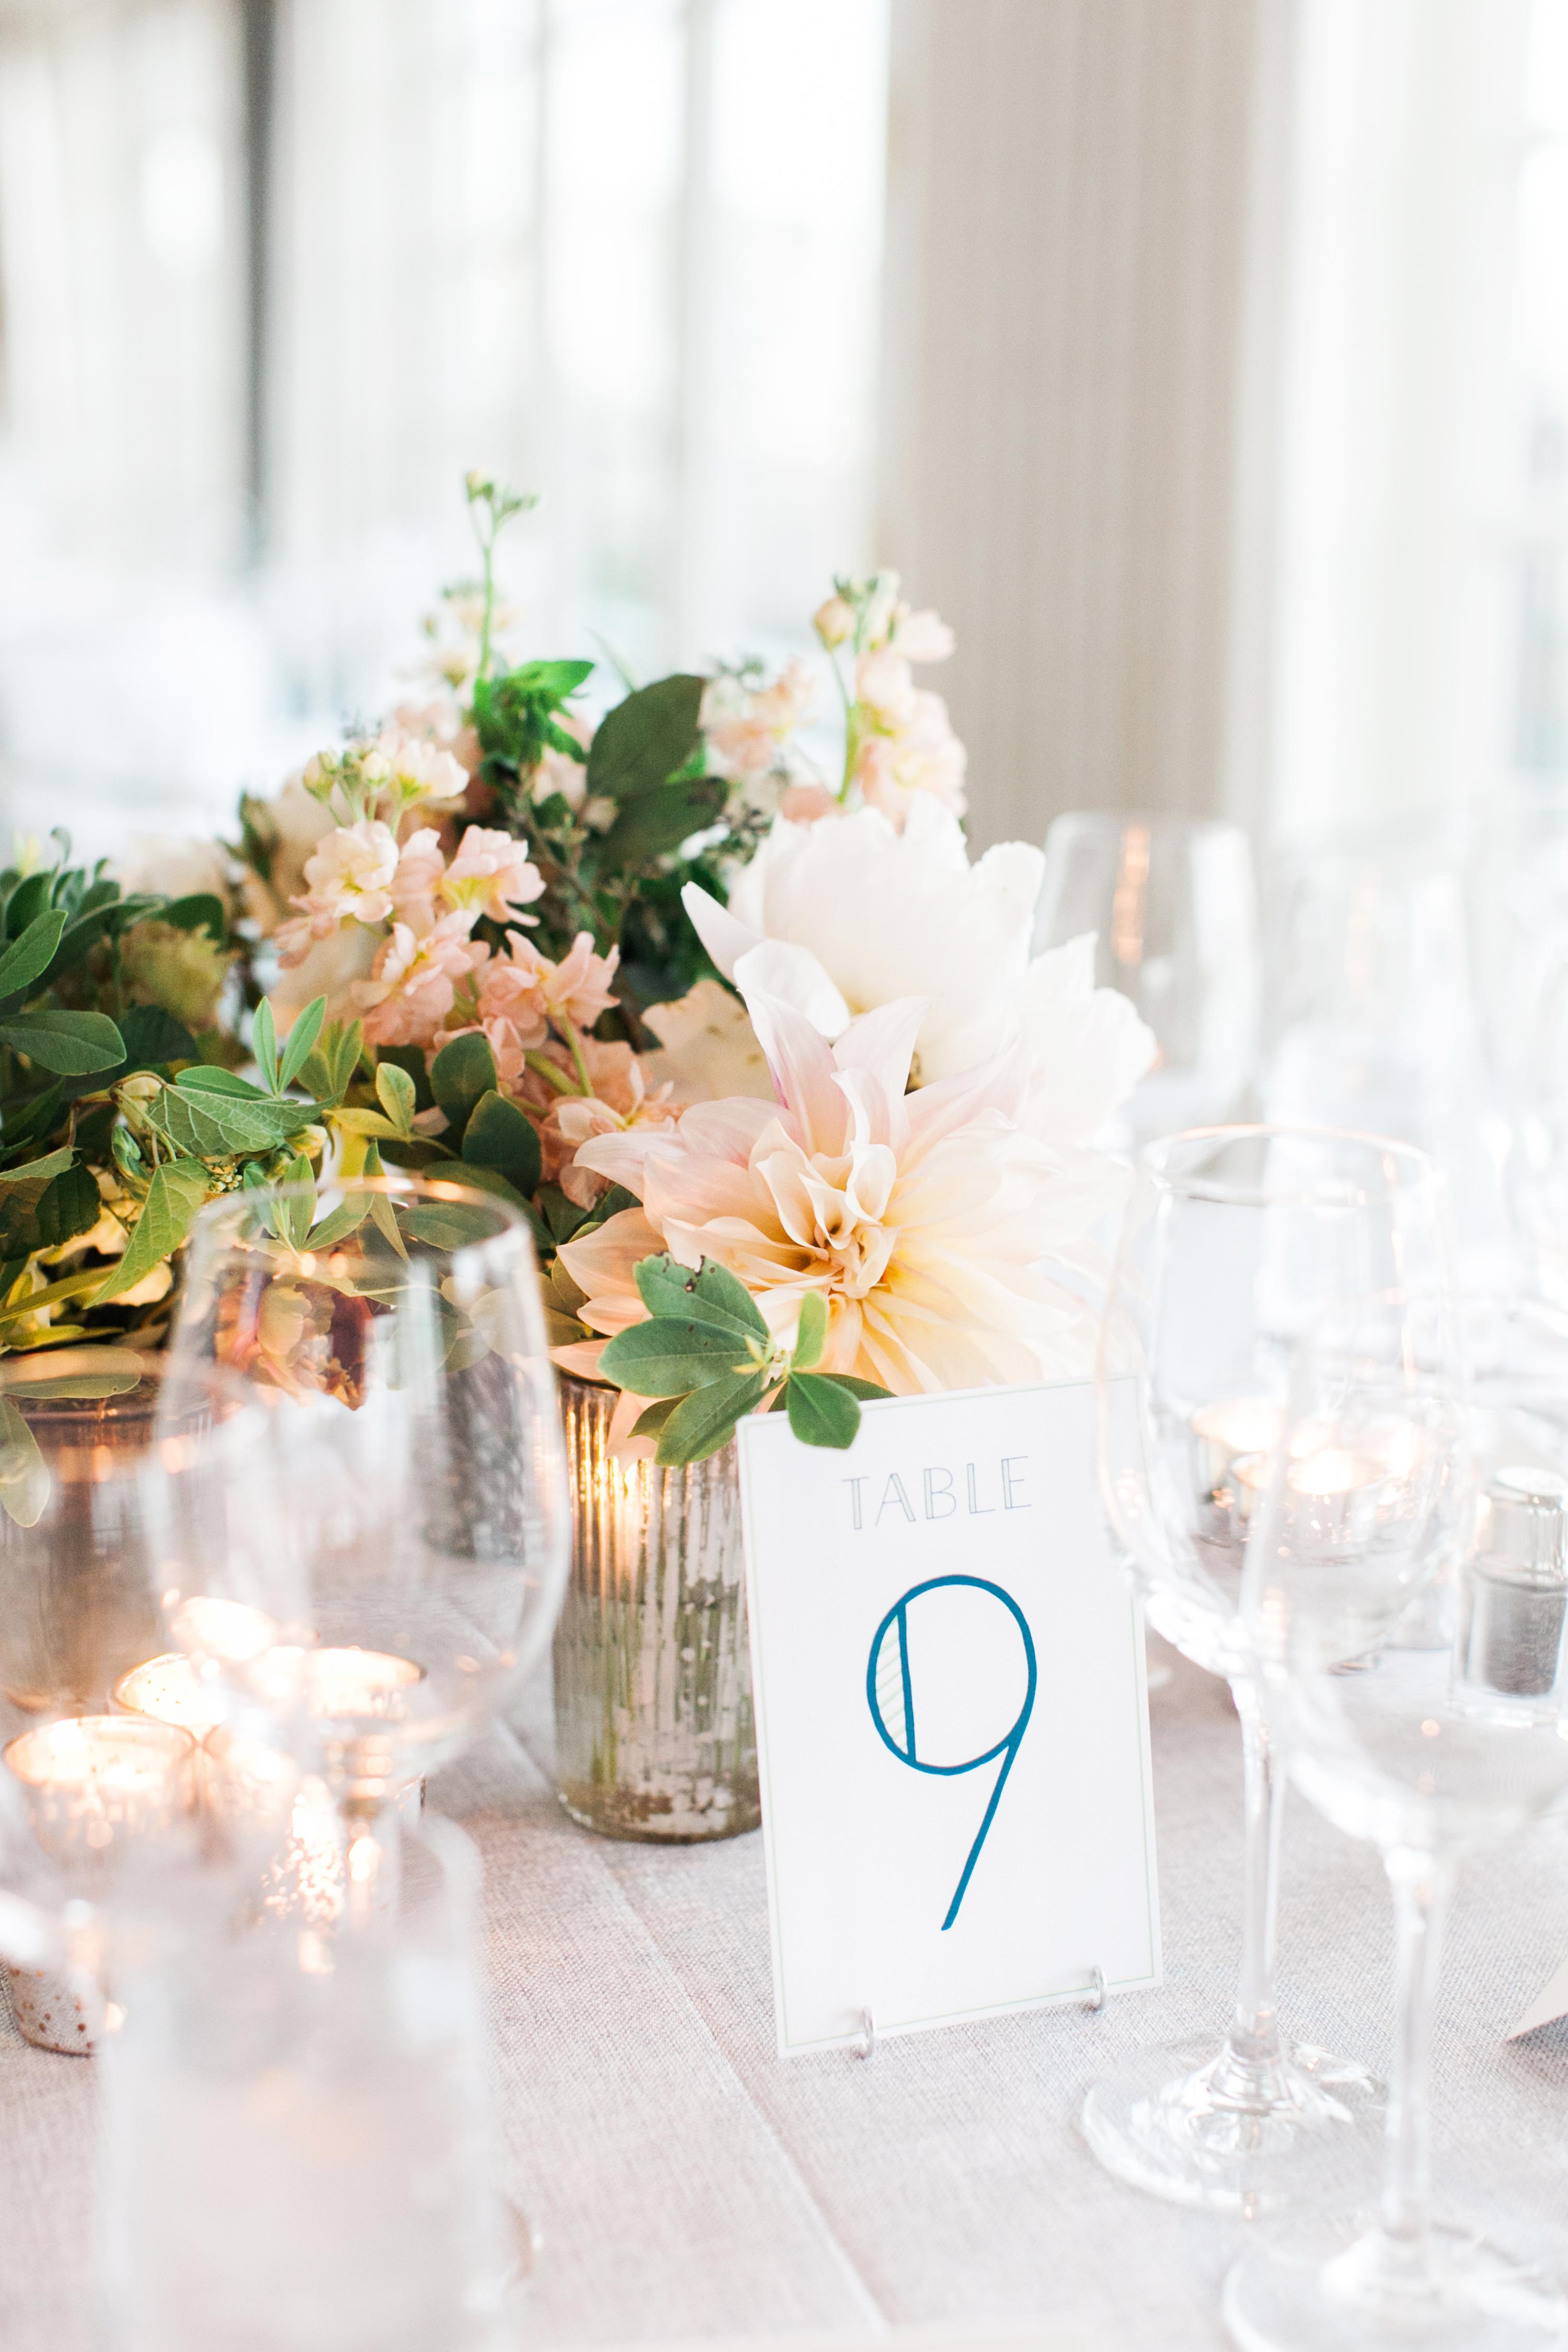 Heartfelt Summer DC Wedding at The Hay-Adams Hotel, DC Wedding Planner Bright Occasions, Astrid Photography